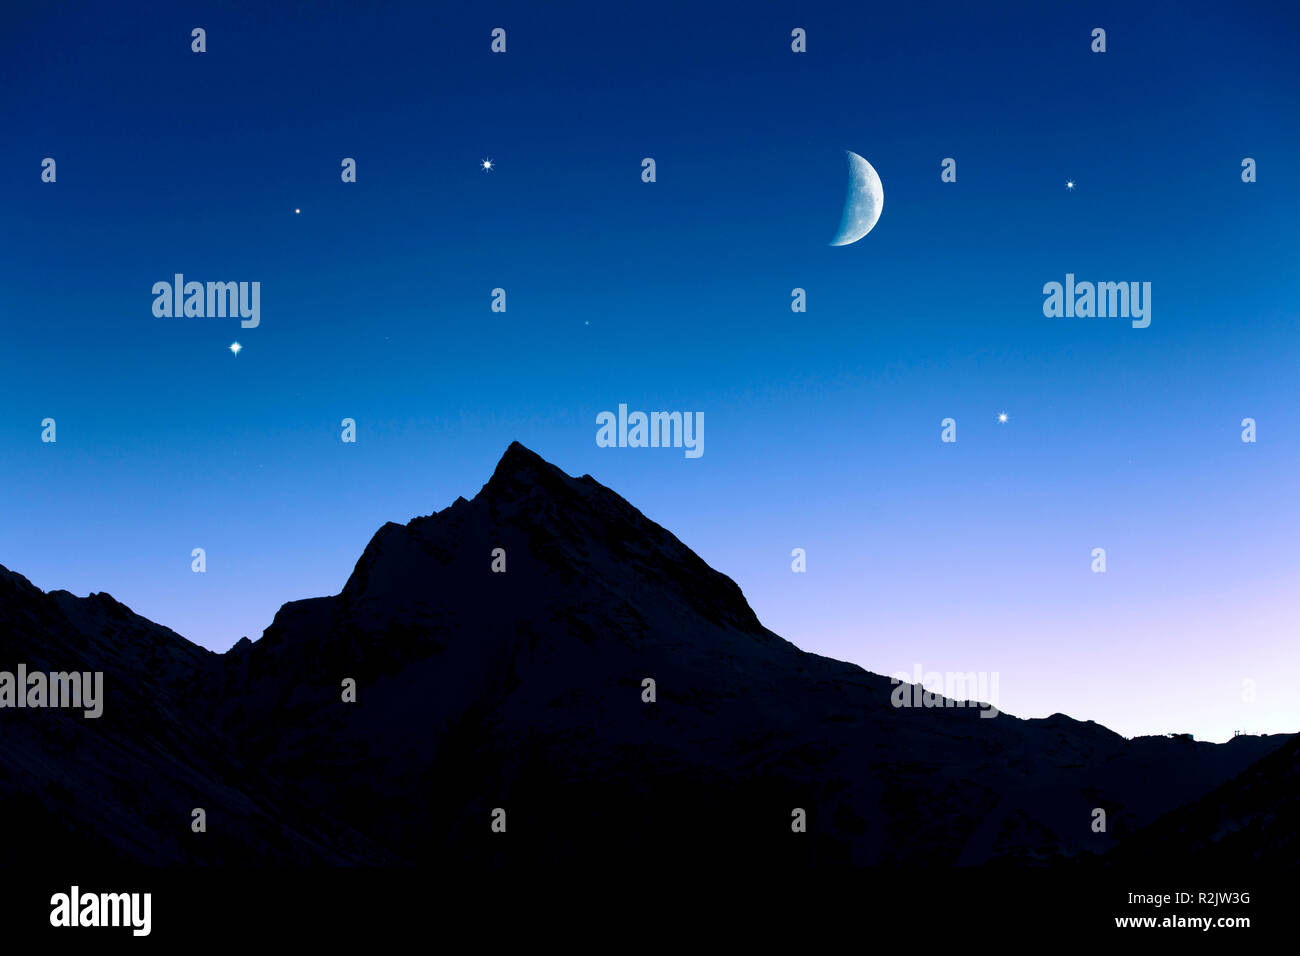 Austria, Tyrol, Galtür, evening sky with moon and stars (M) - Stock Image